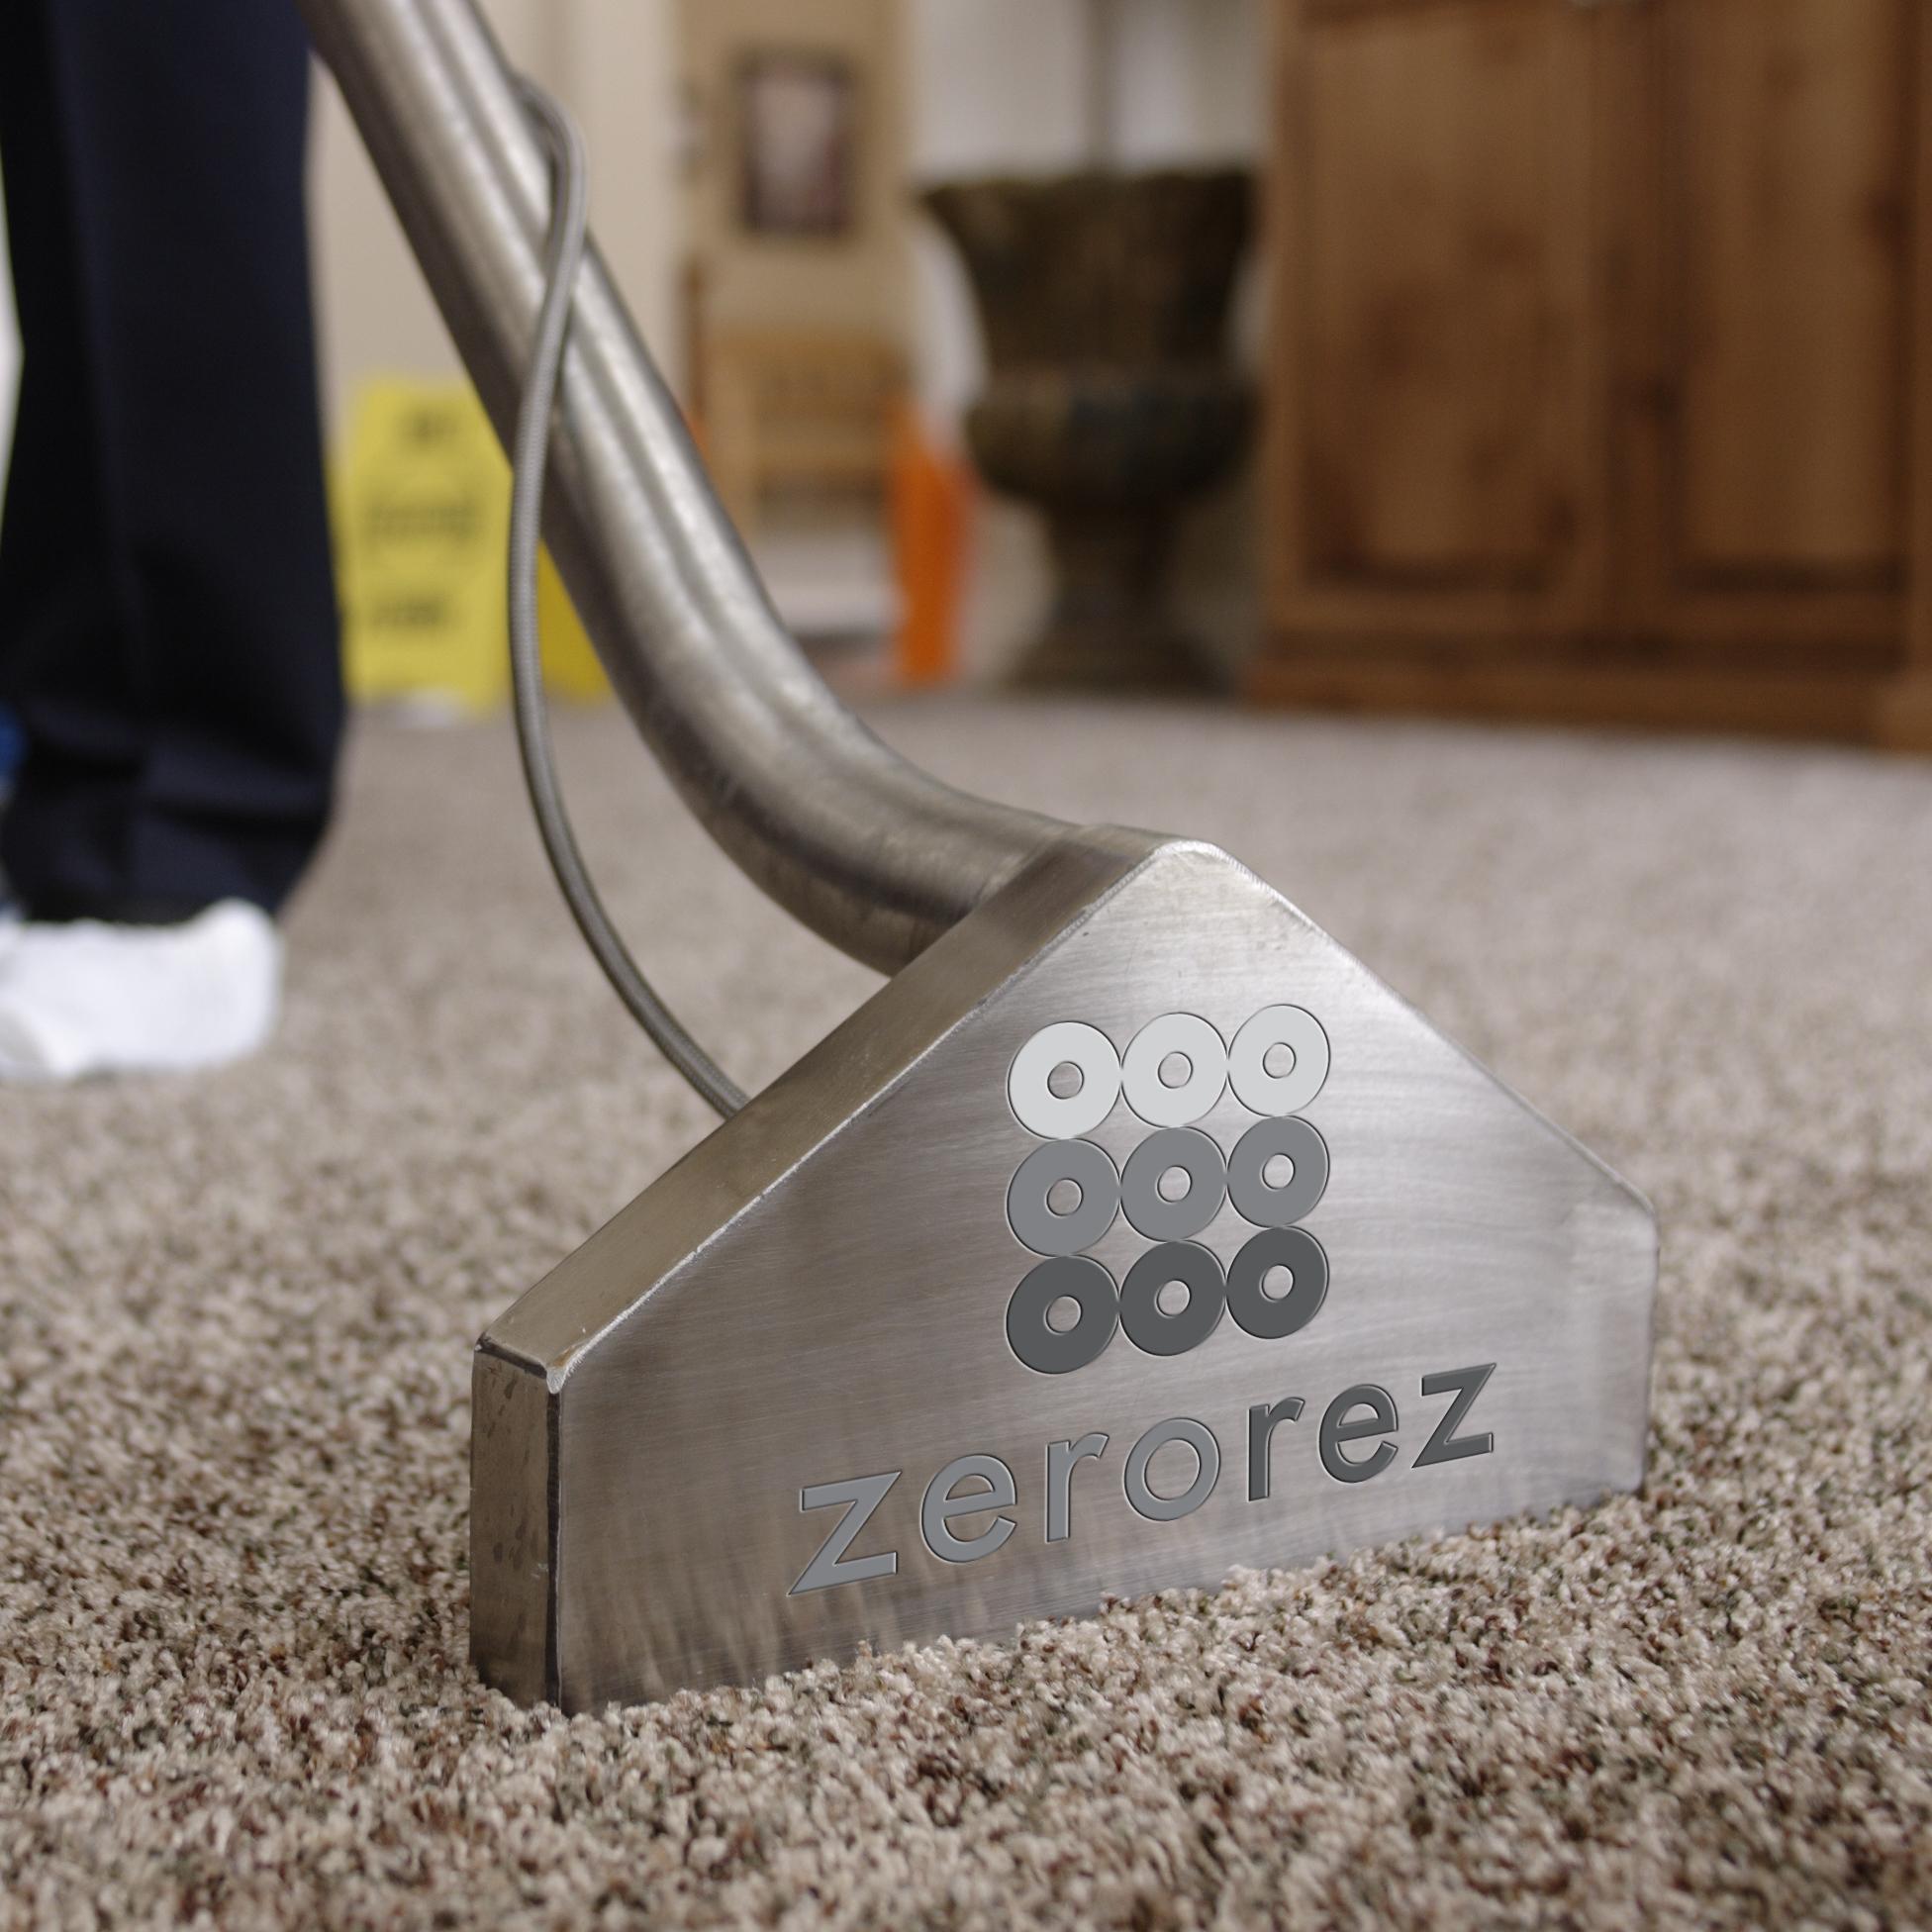 zerorez carpet cleaning st george utah vidalondon